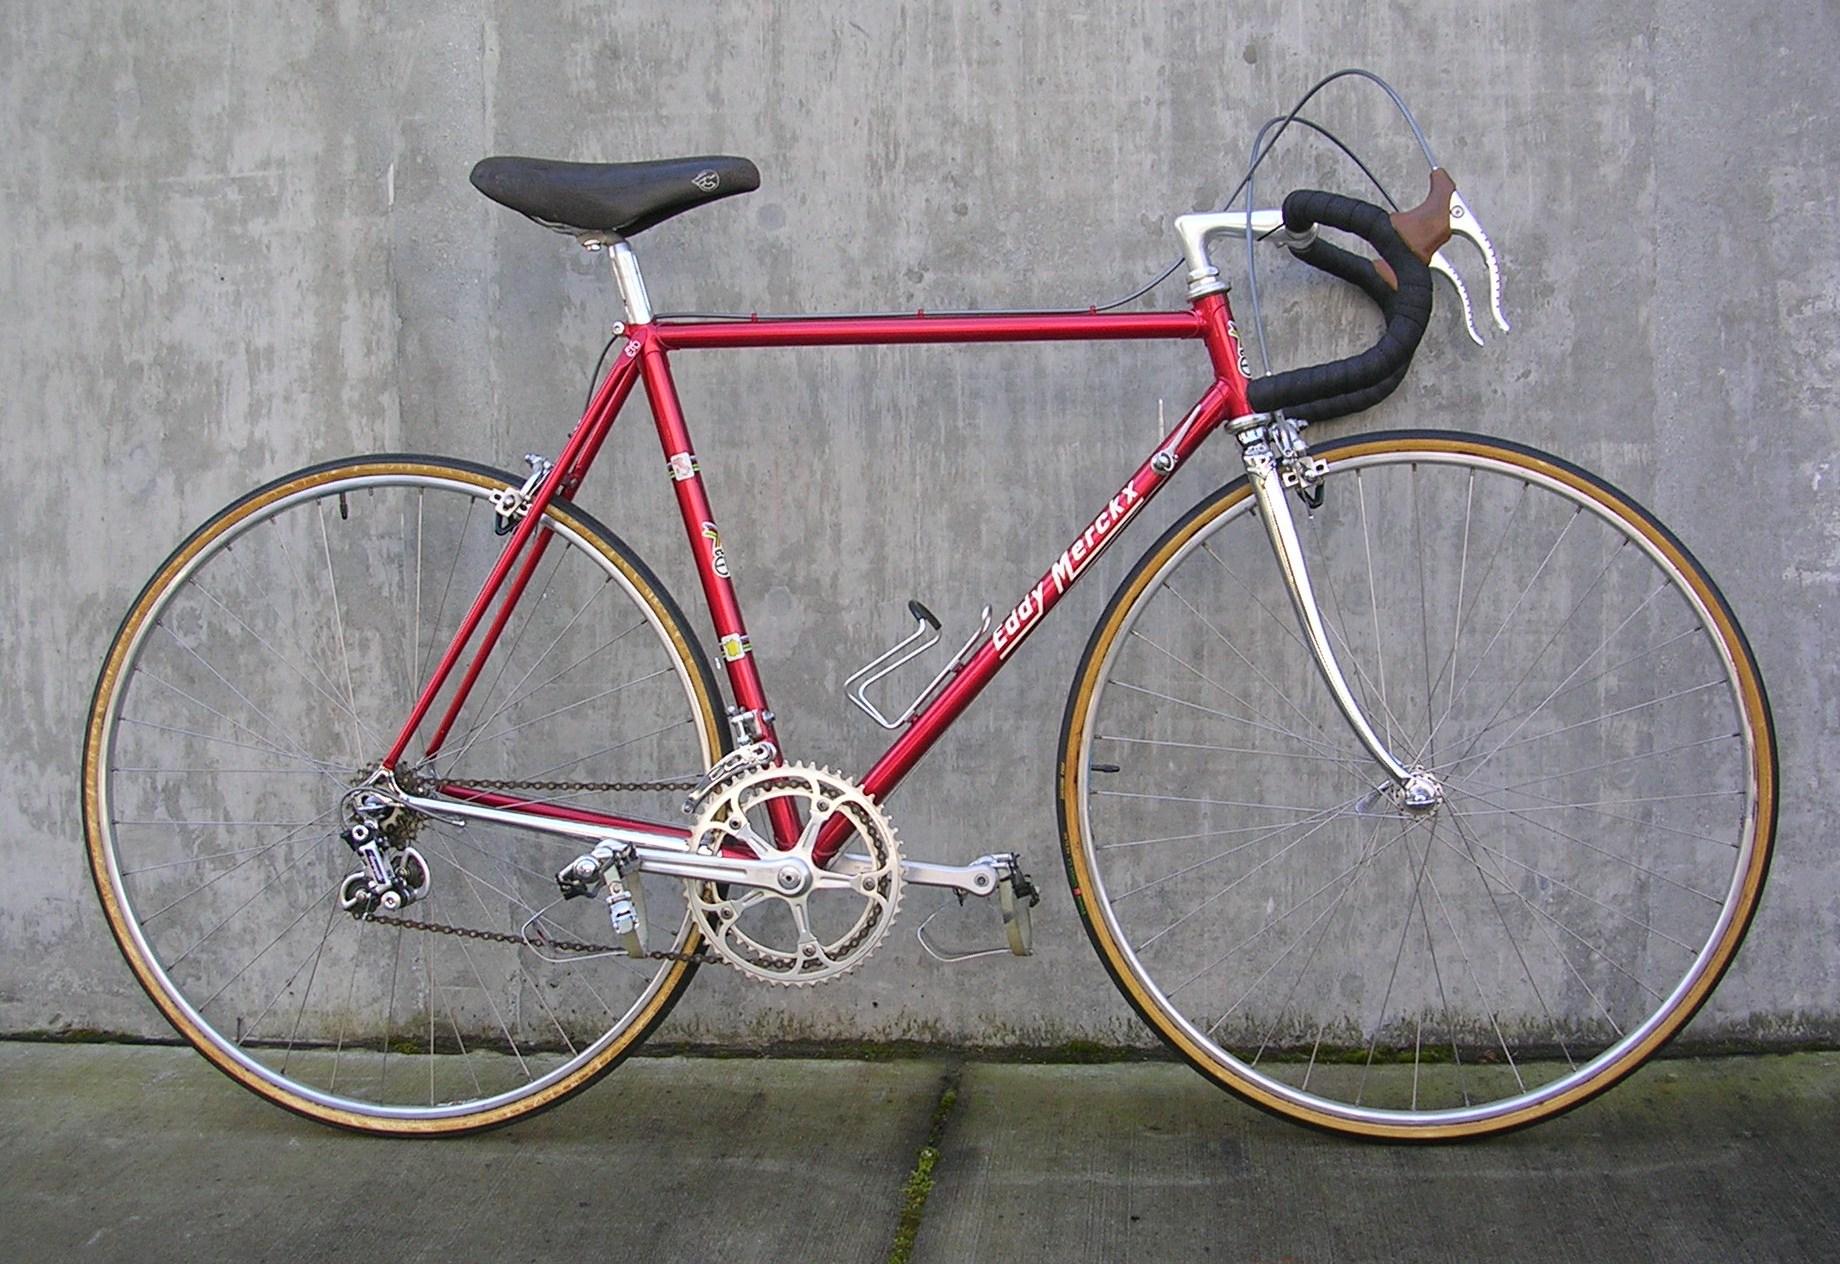 Classic Eddy Merckx Racing Bike Classic Cycle Bainbridge